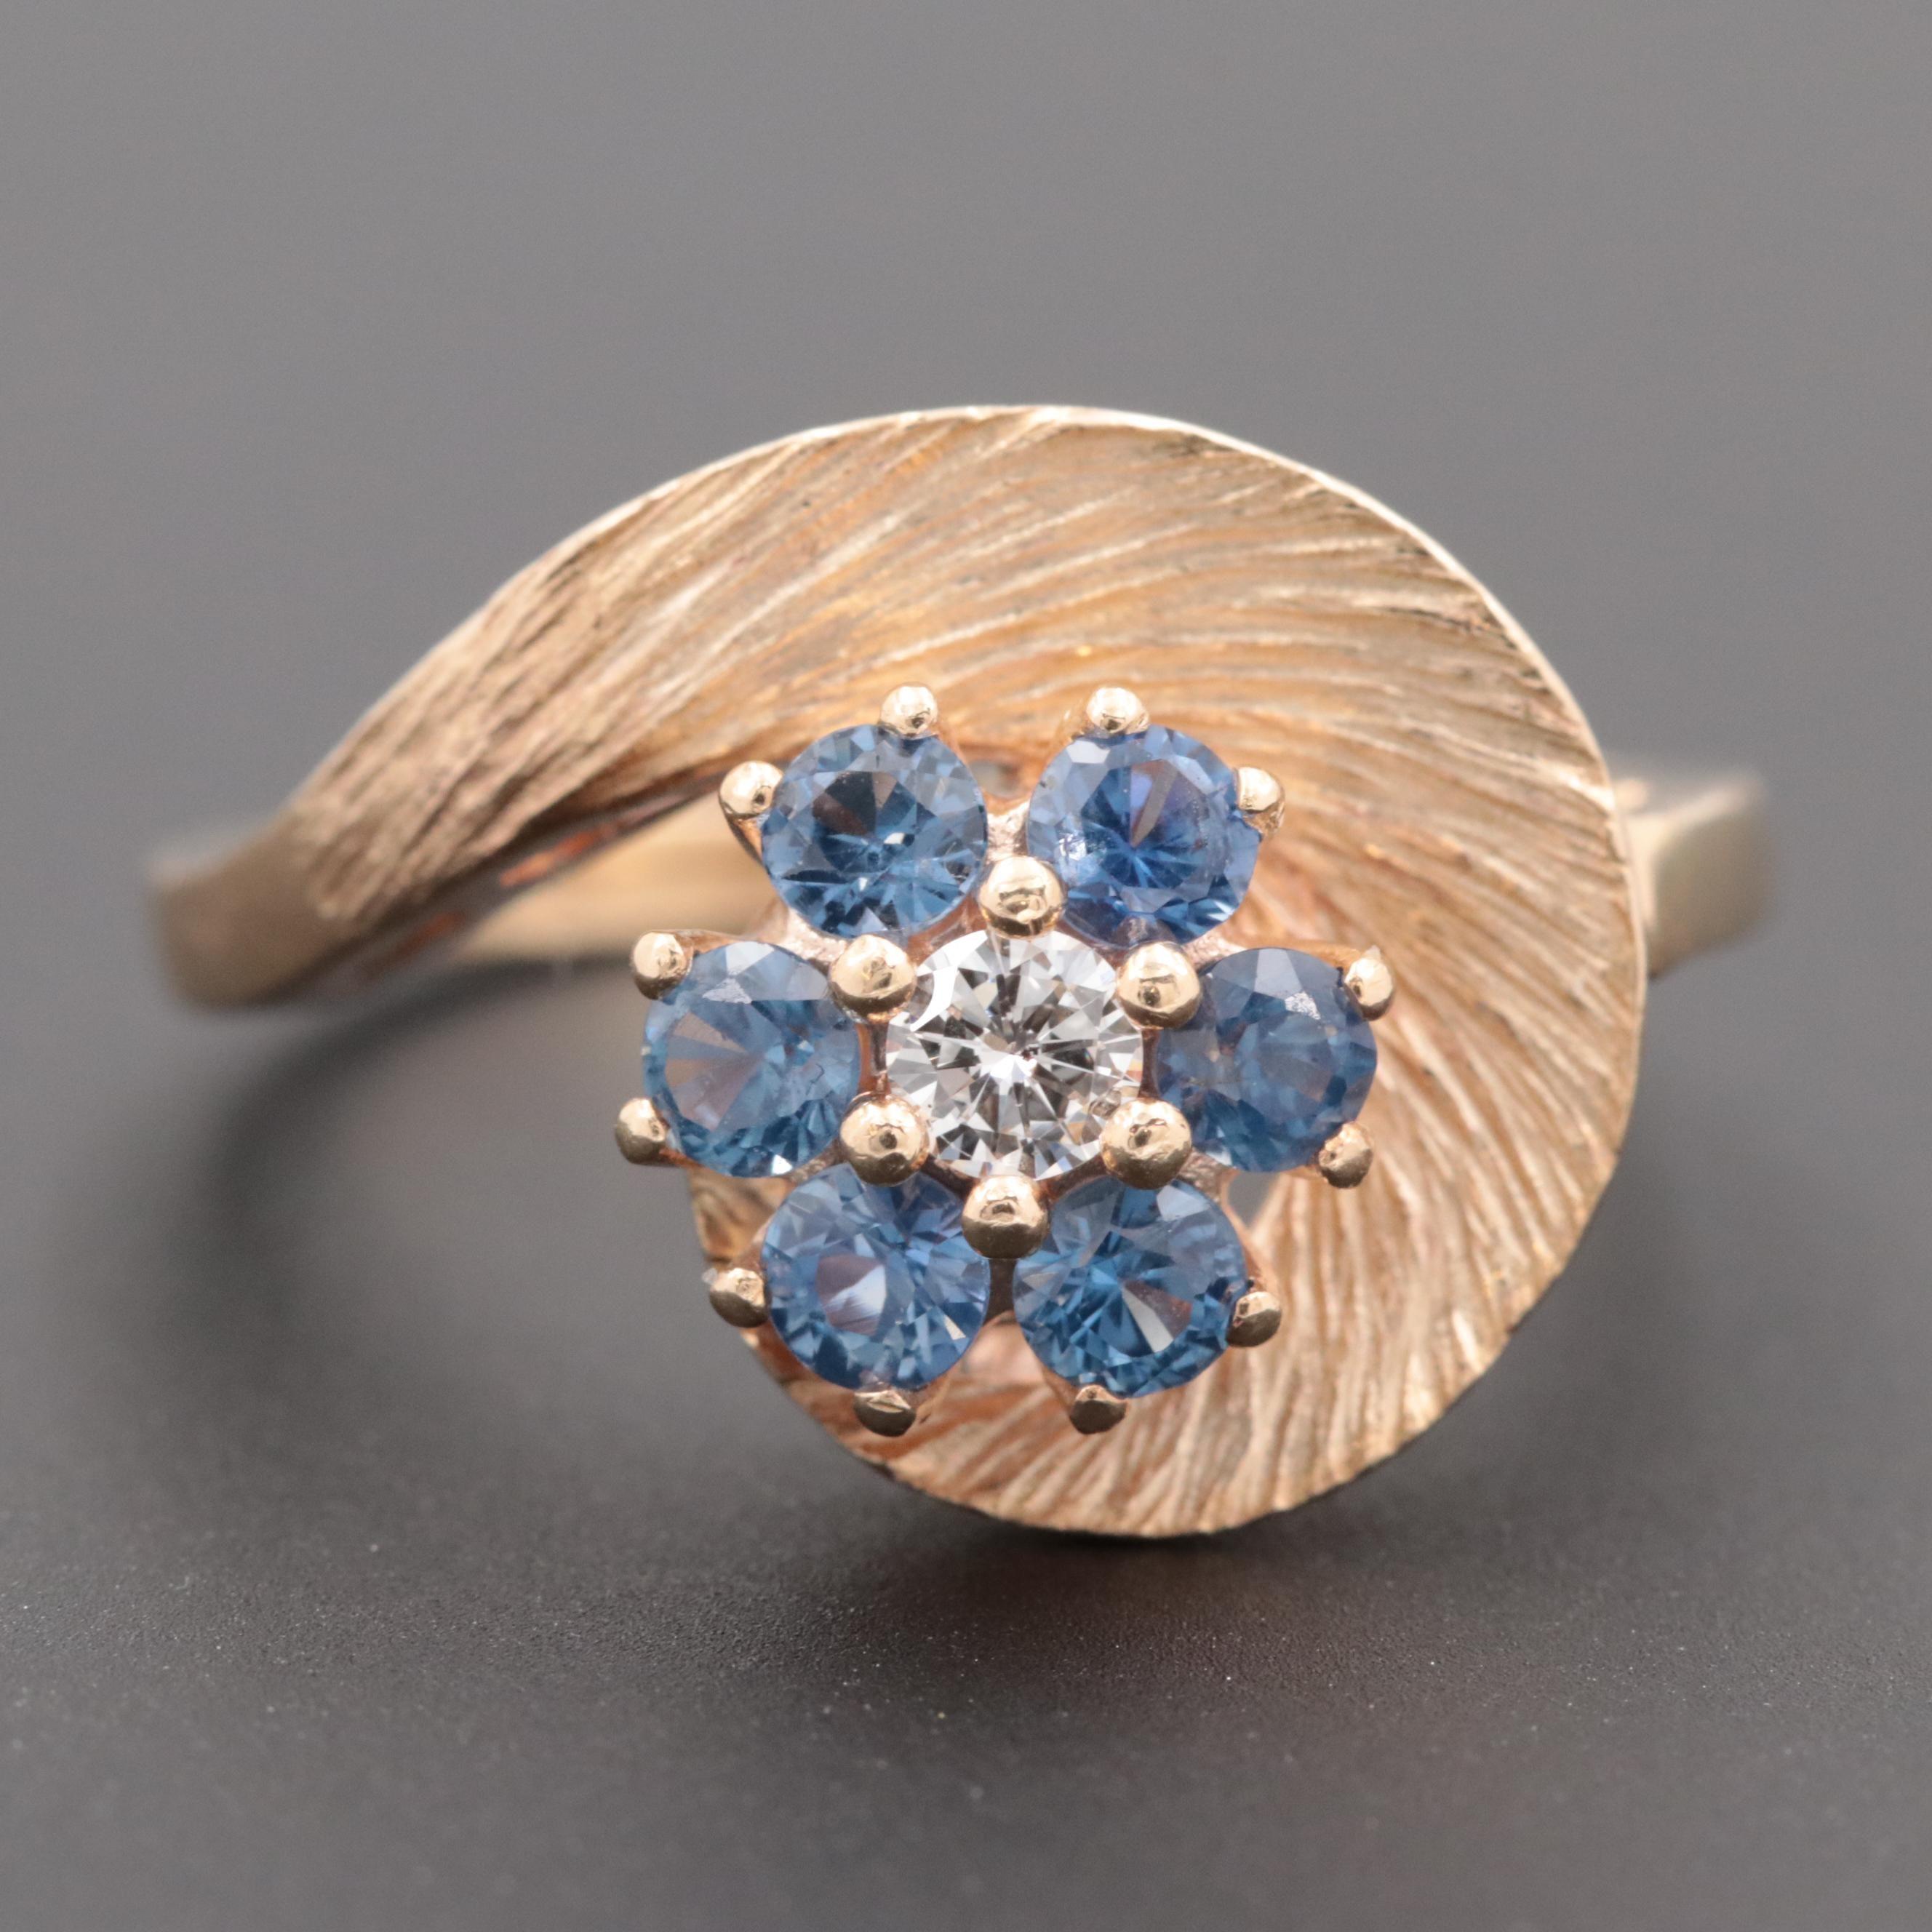 Vintage Circa 1960s 14K Yellow Gold Diamond and Blue Sapphire Ring